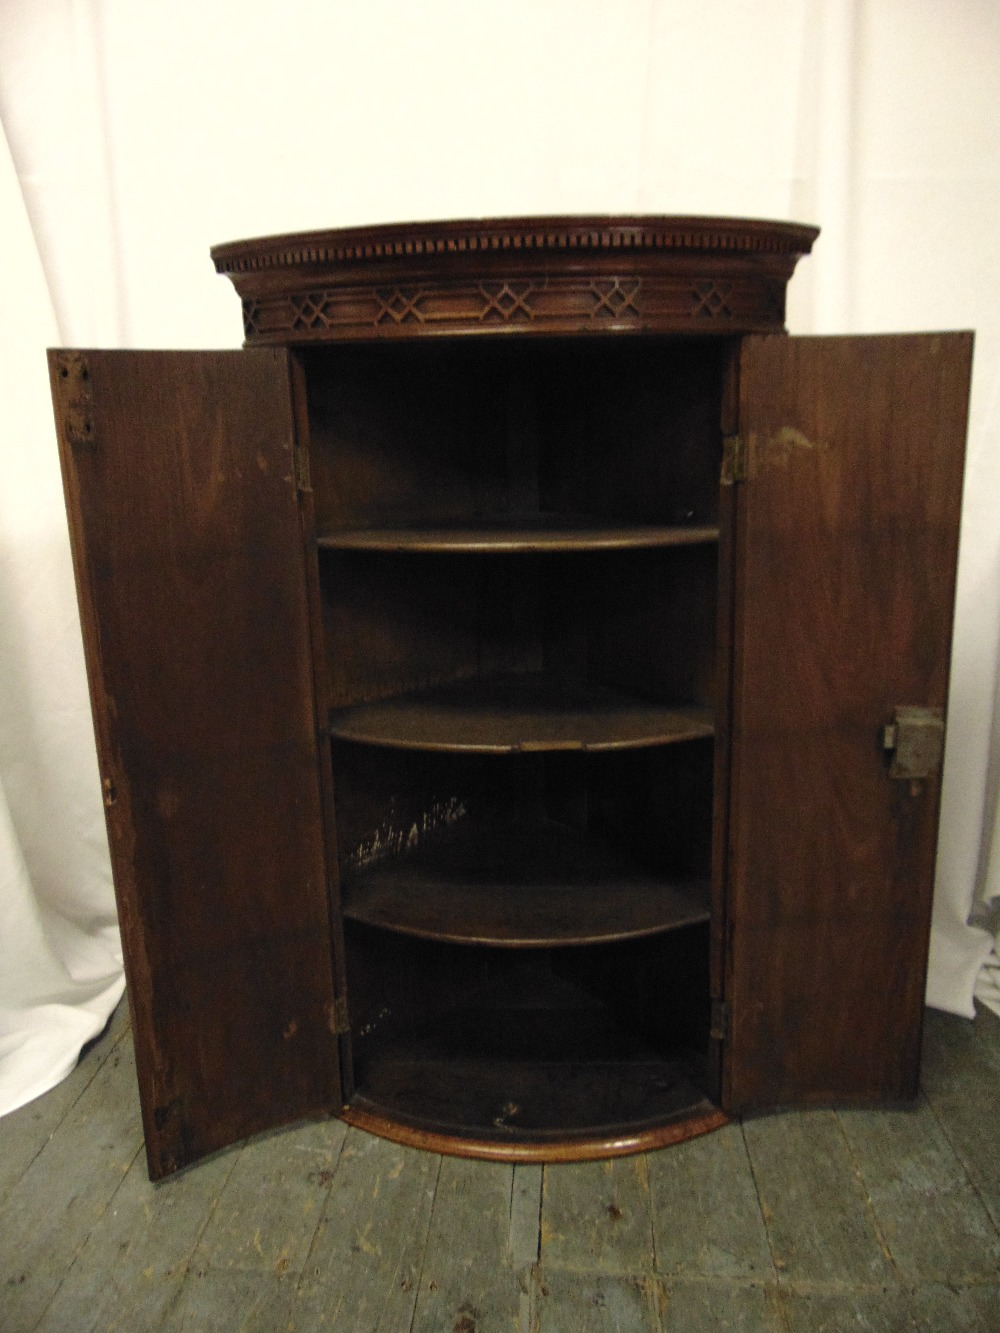 Lot 6 - A mahogany inlaid wall mounted corner cabinet with hinged doors